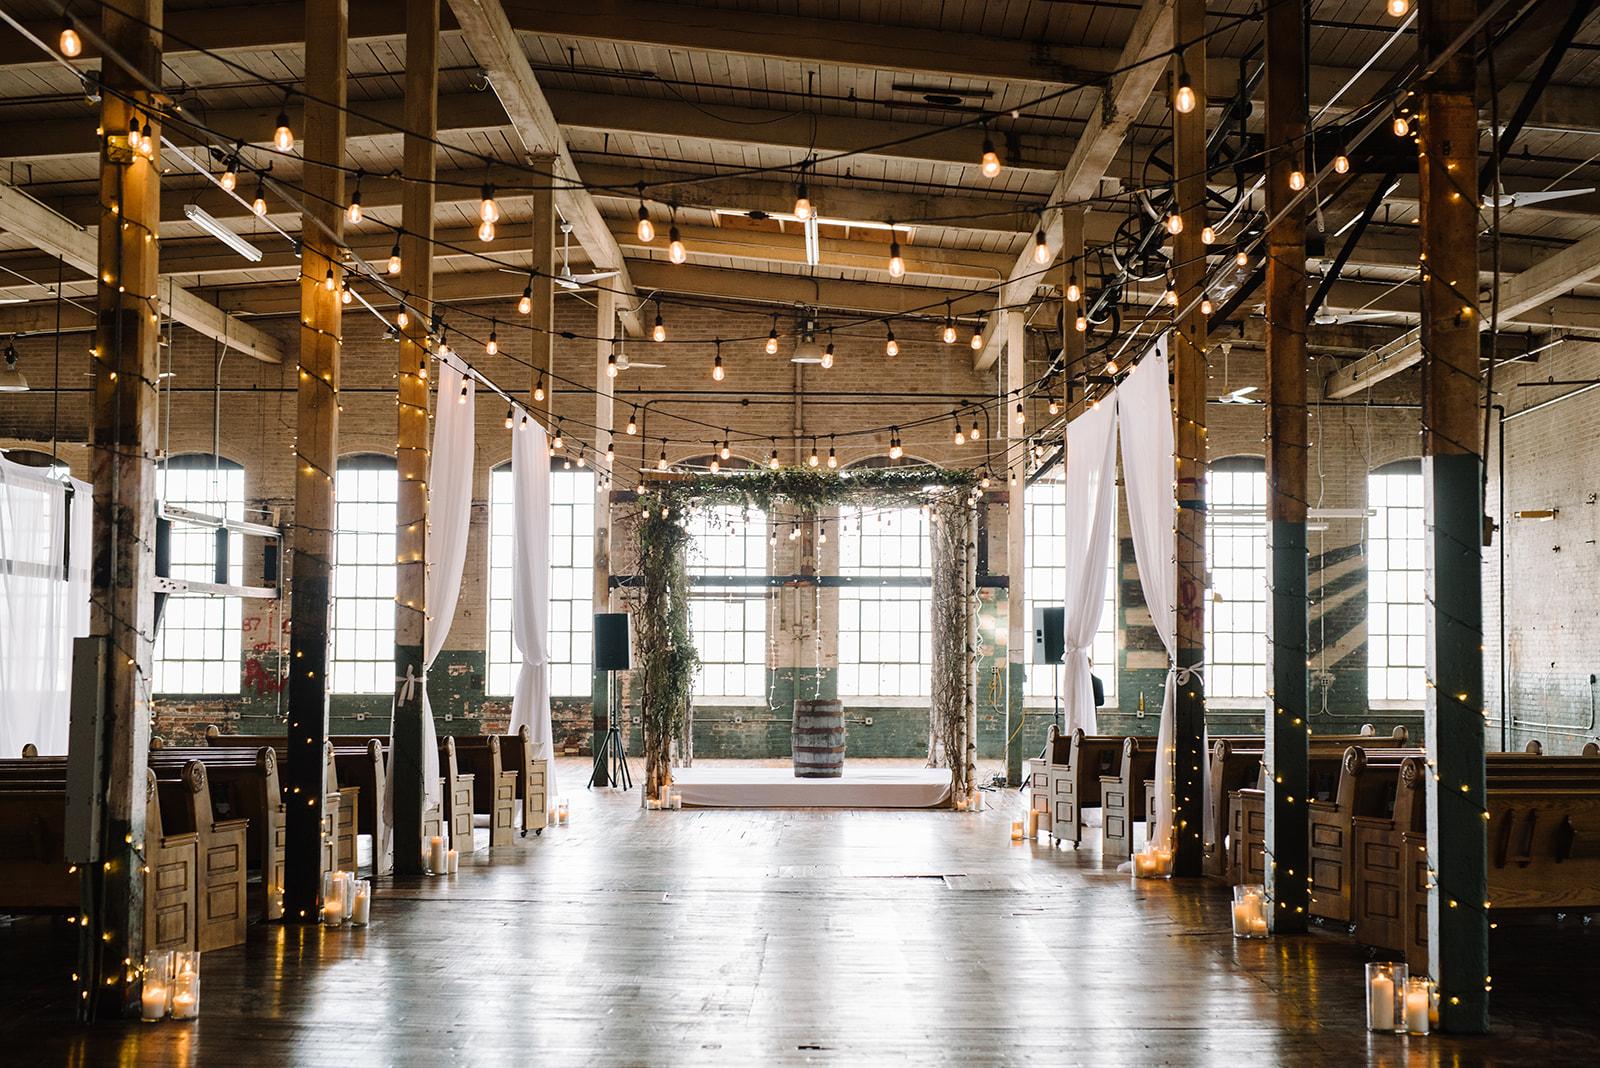 Art Factory Wedding- Industrial Chic- Audrey+Ryan- Paterson NJ- Olivia Christina Photo (34).jpg